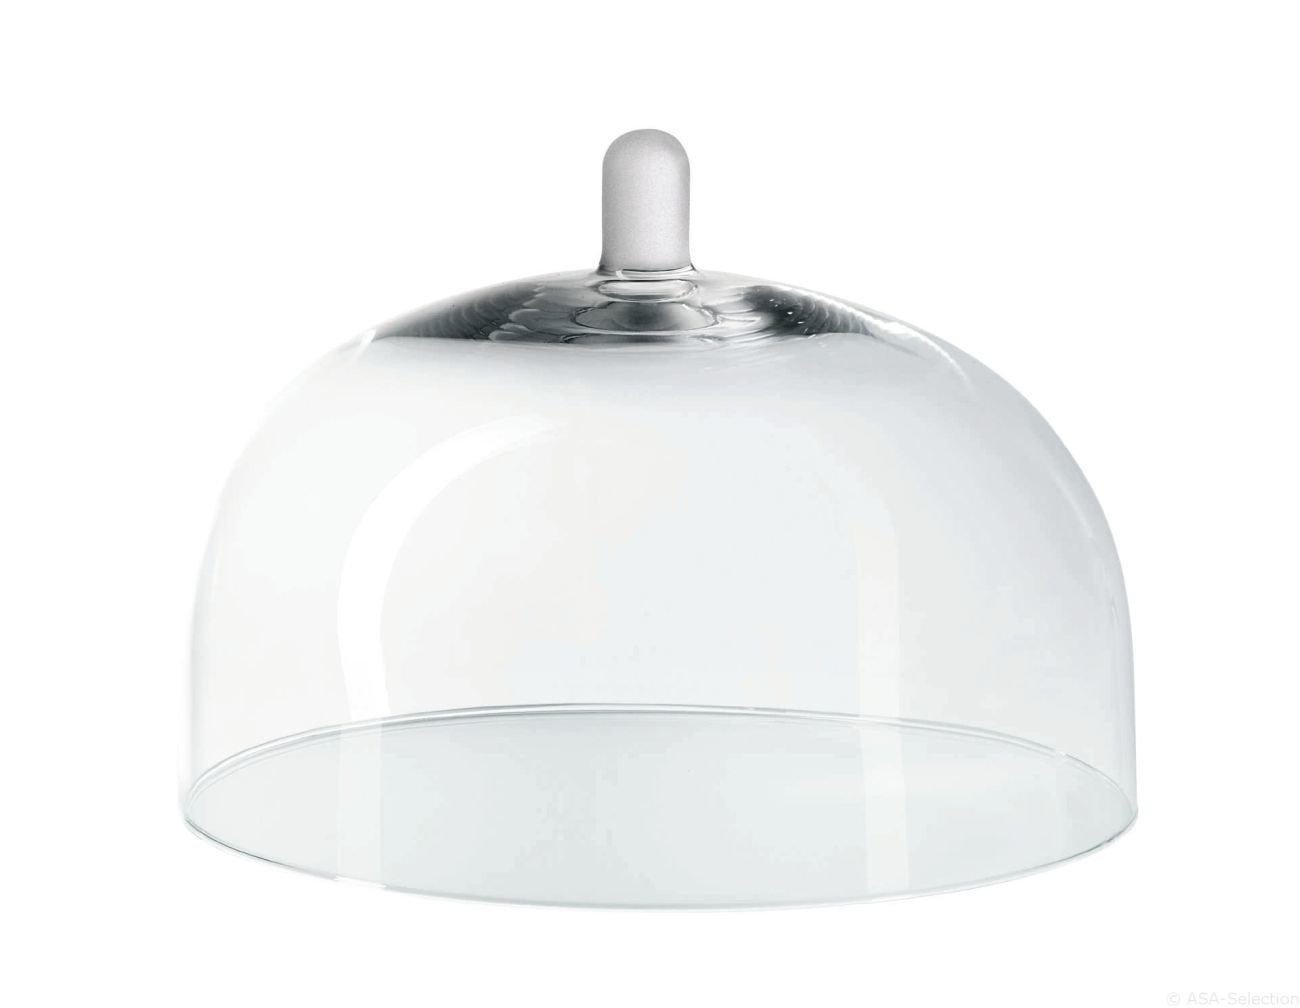 ASA 5317009 Big glass cake dome, 20 x 20 x 17 cm